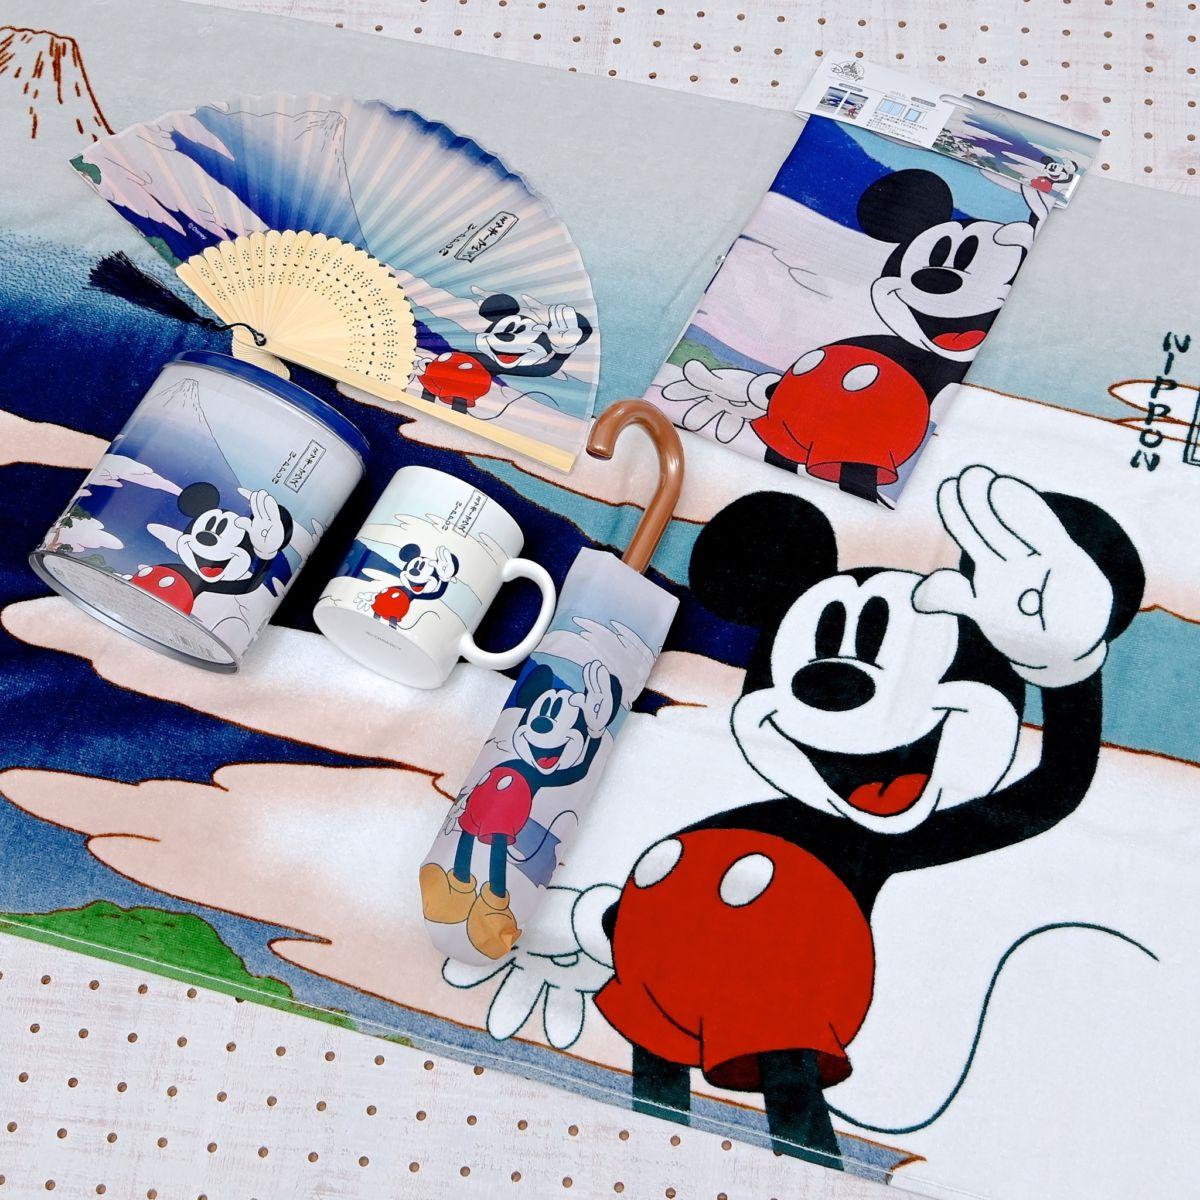 shopDisney(ショップディズニー)浮世絵アート風ミッキーマウスグッズ